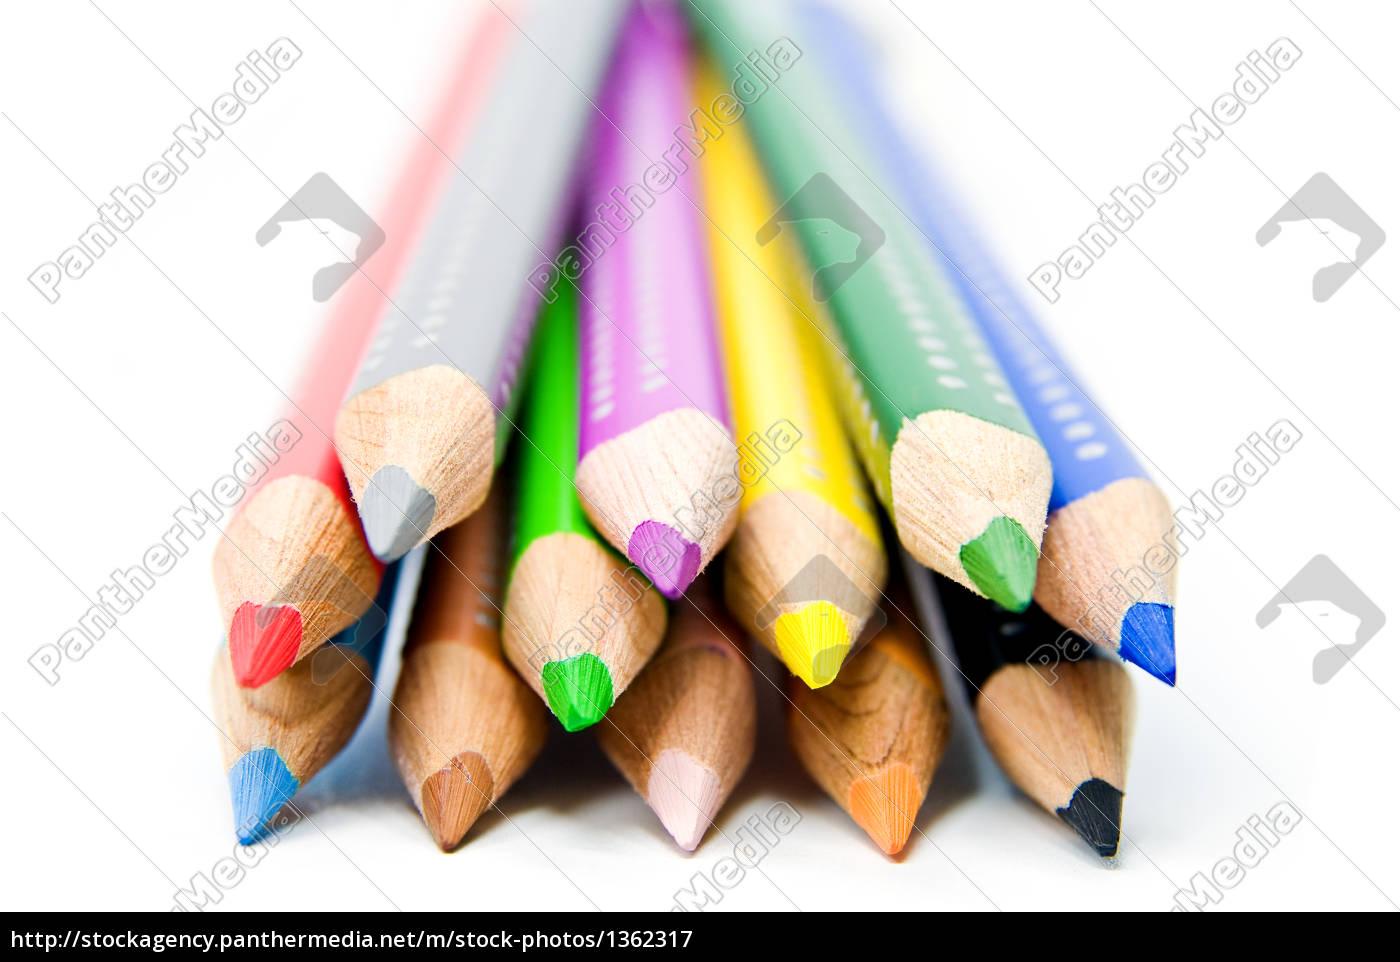 colored, pencils - 1362317